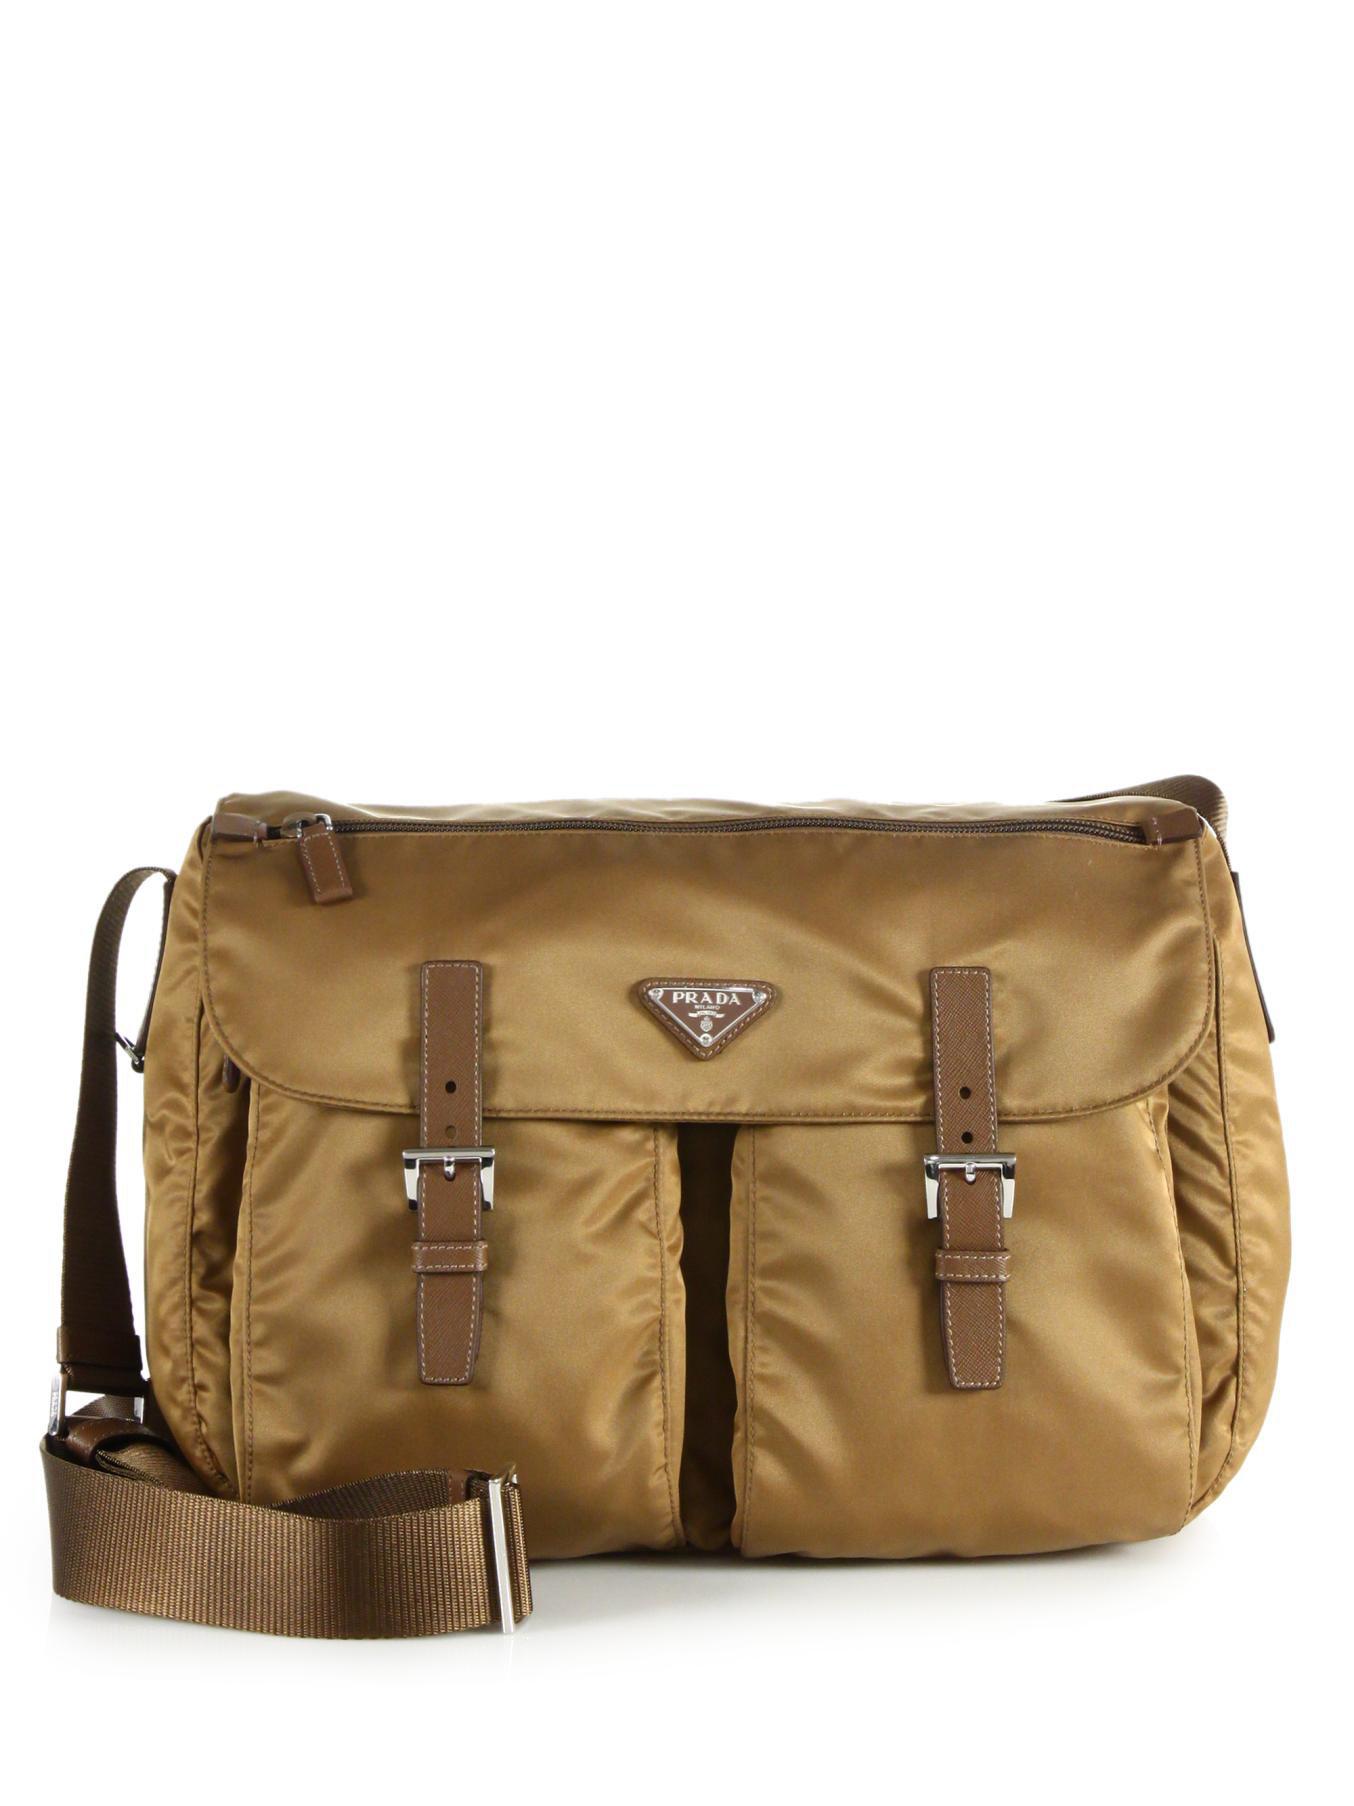 Prada Vela Two-pocket Messenger Bag in Brown (tobacco) | Lyst